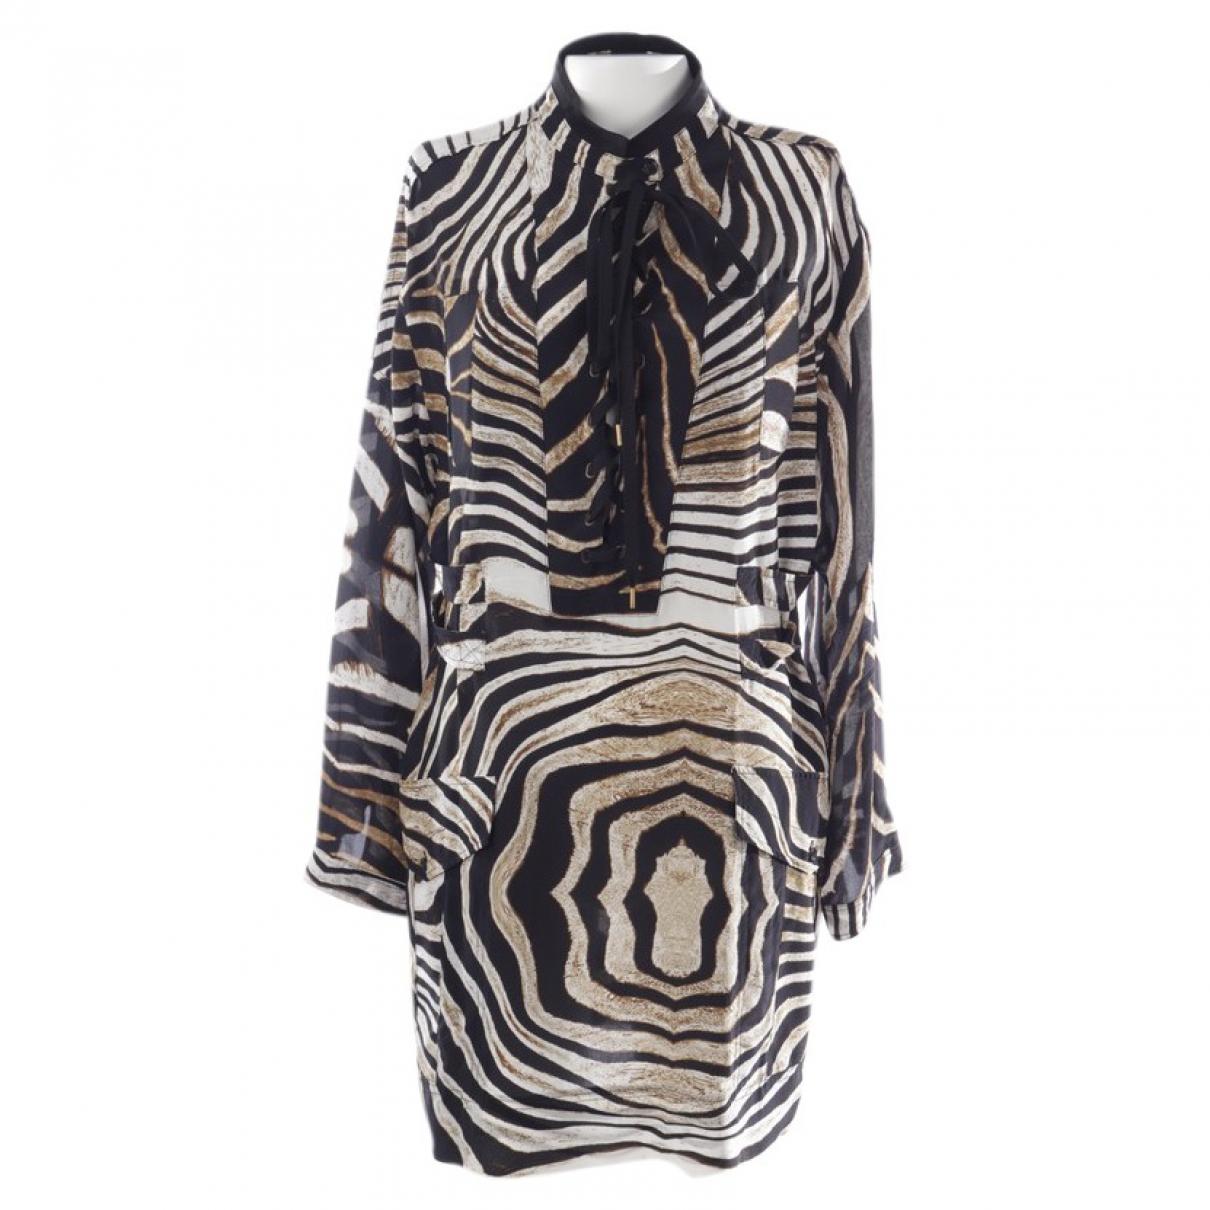 Just Cavalli N Multicolour Silk dress for Women 36 FR